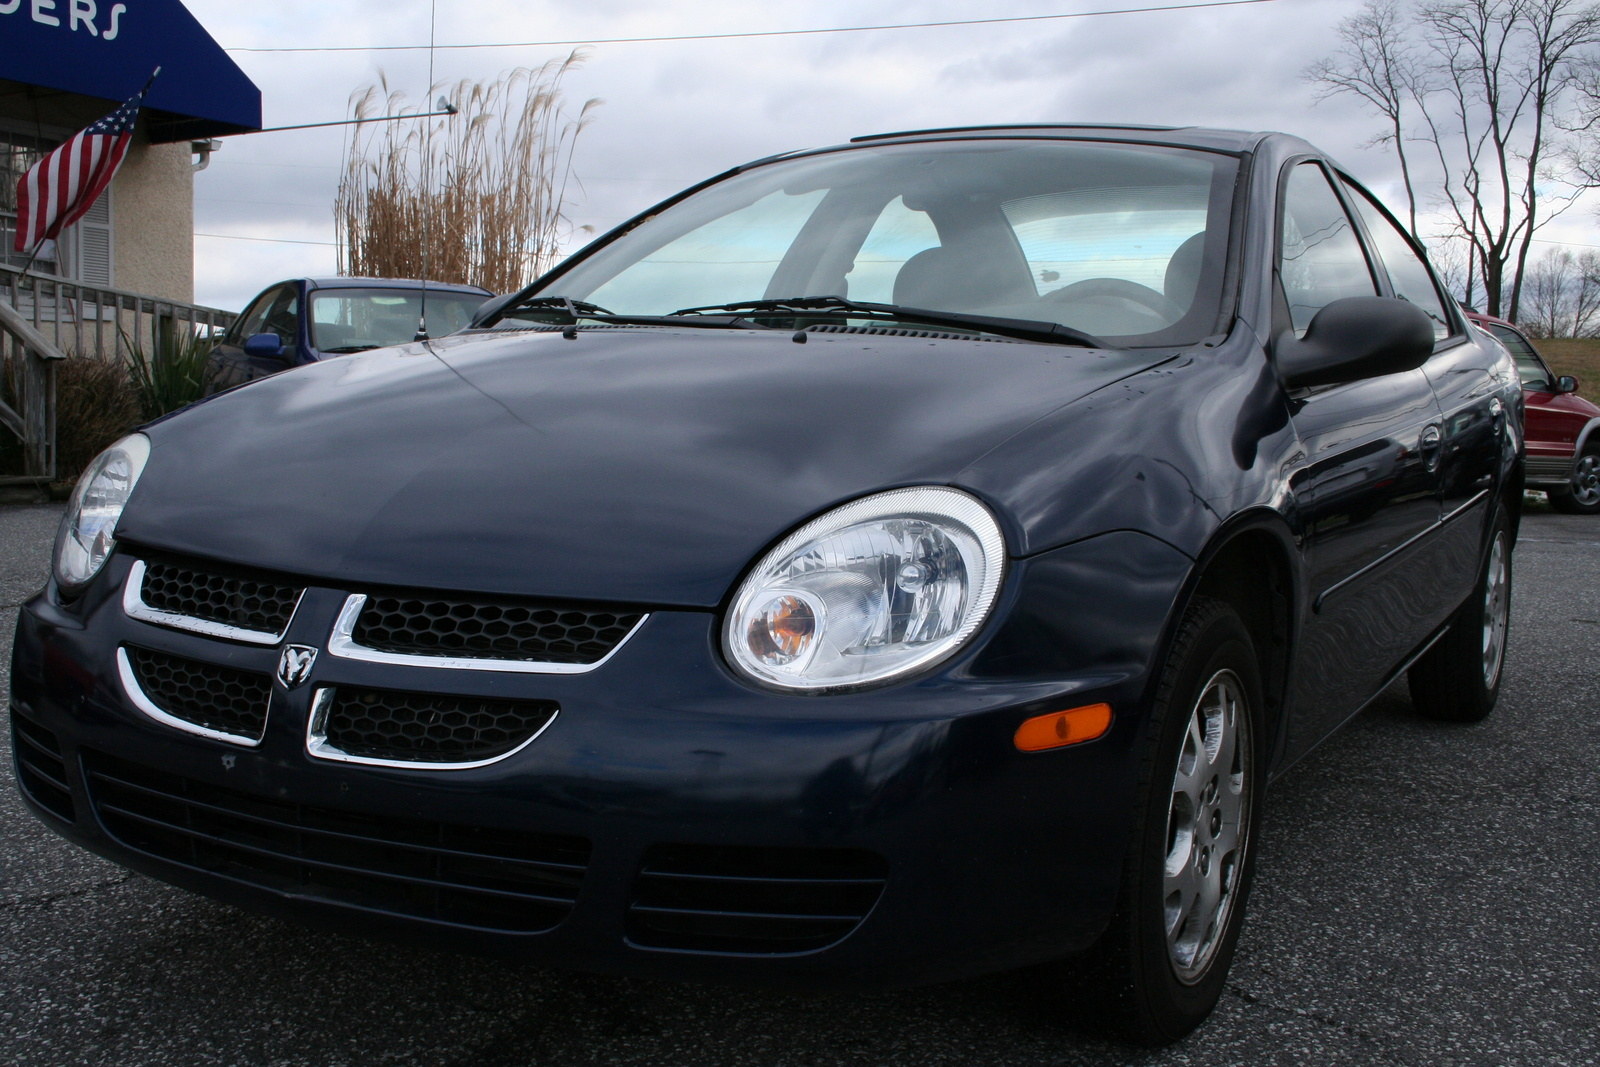 2005 Dodge Neon - Pictures